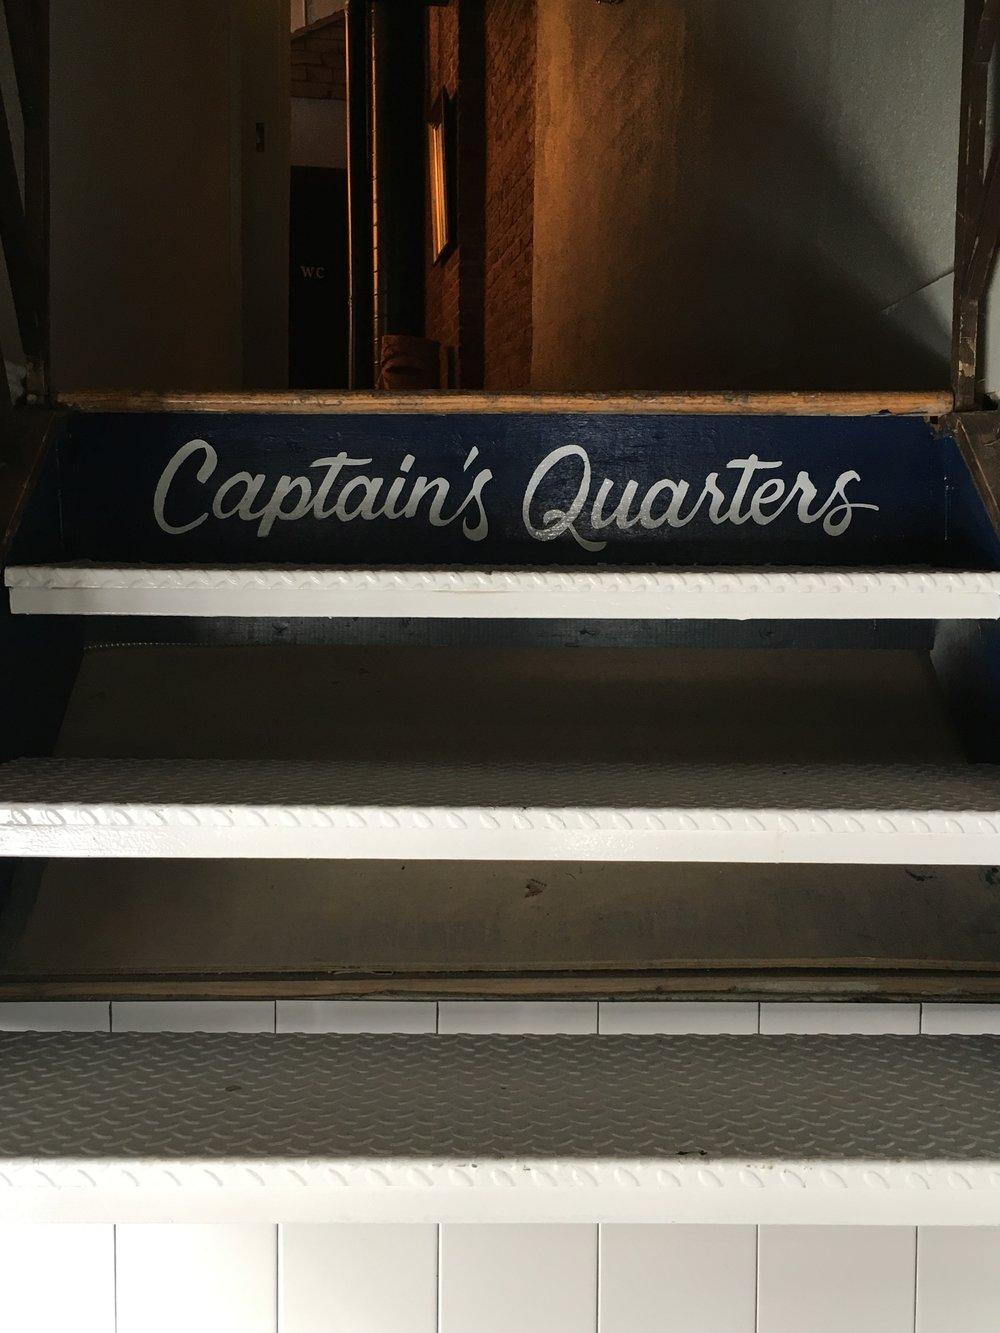 StJ_CaptainsQuarters.JPG